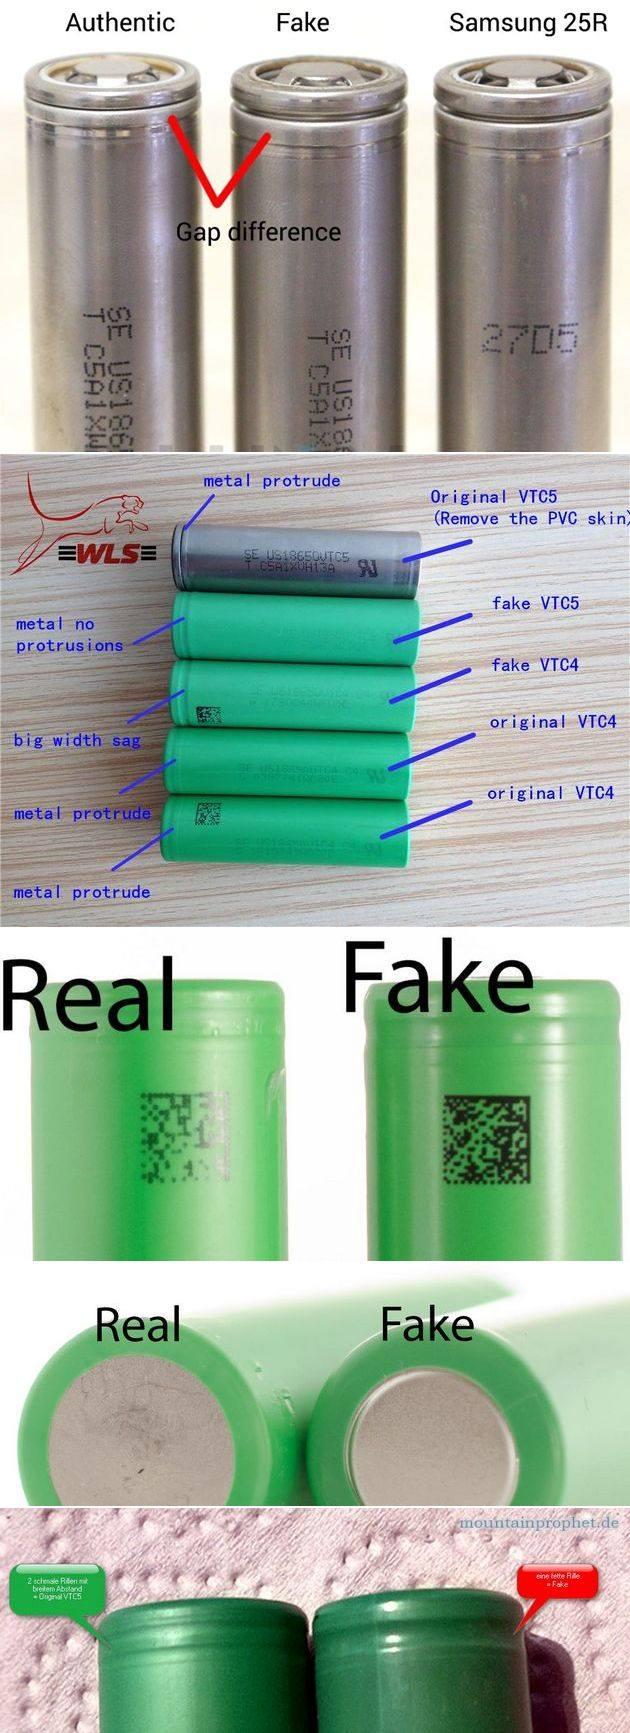 fake-li-ion-battery-fake-vtc-sony-battery-fakew